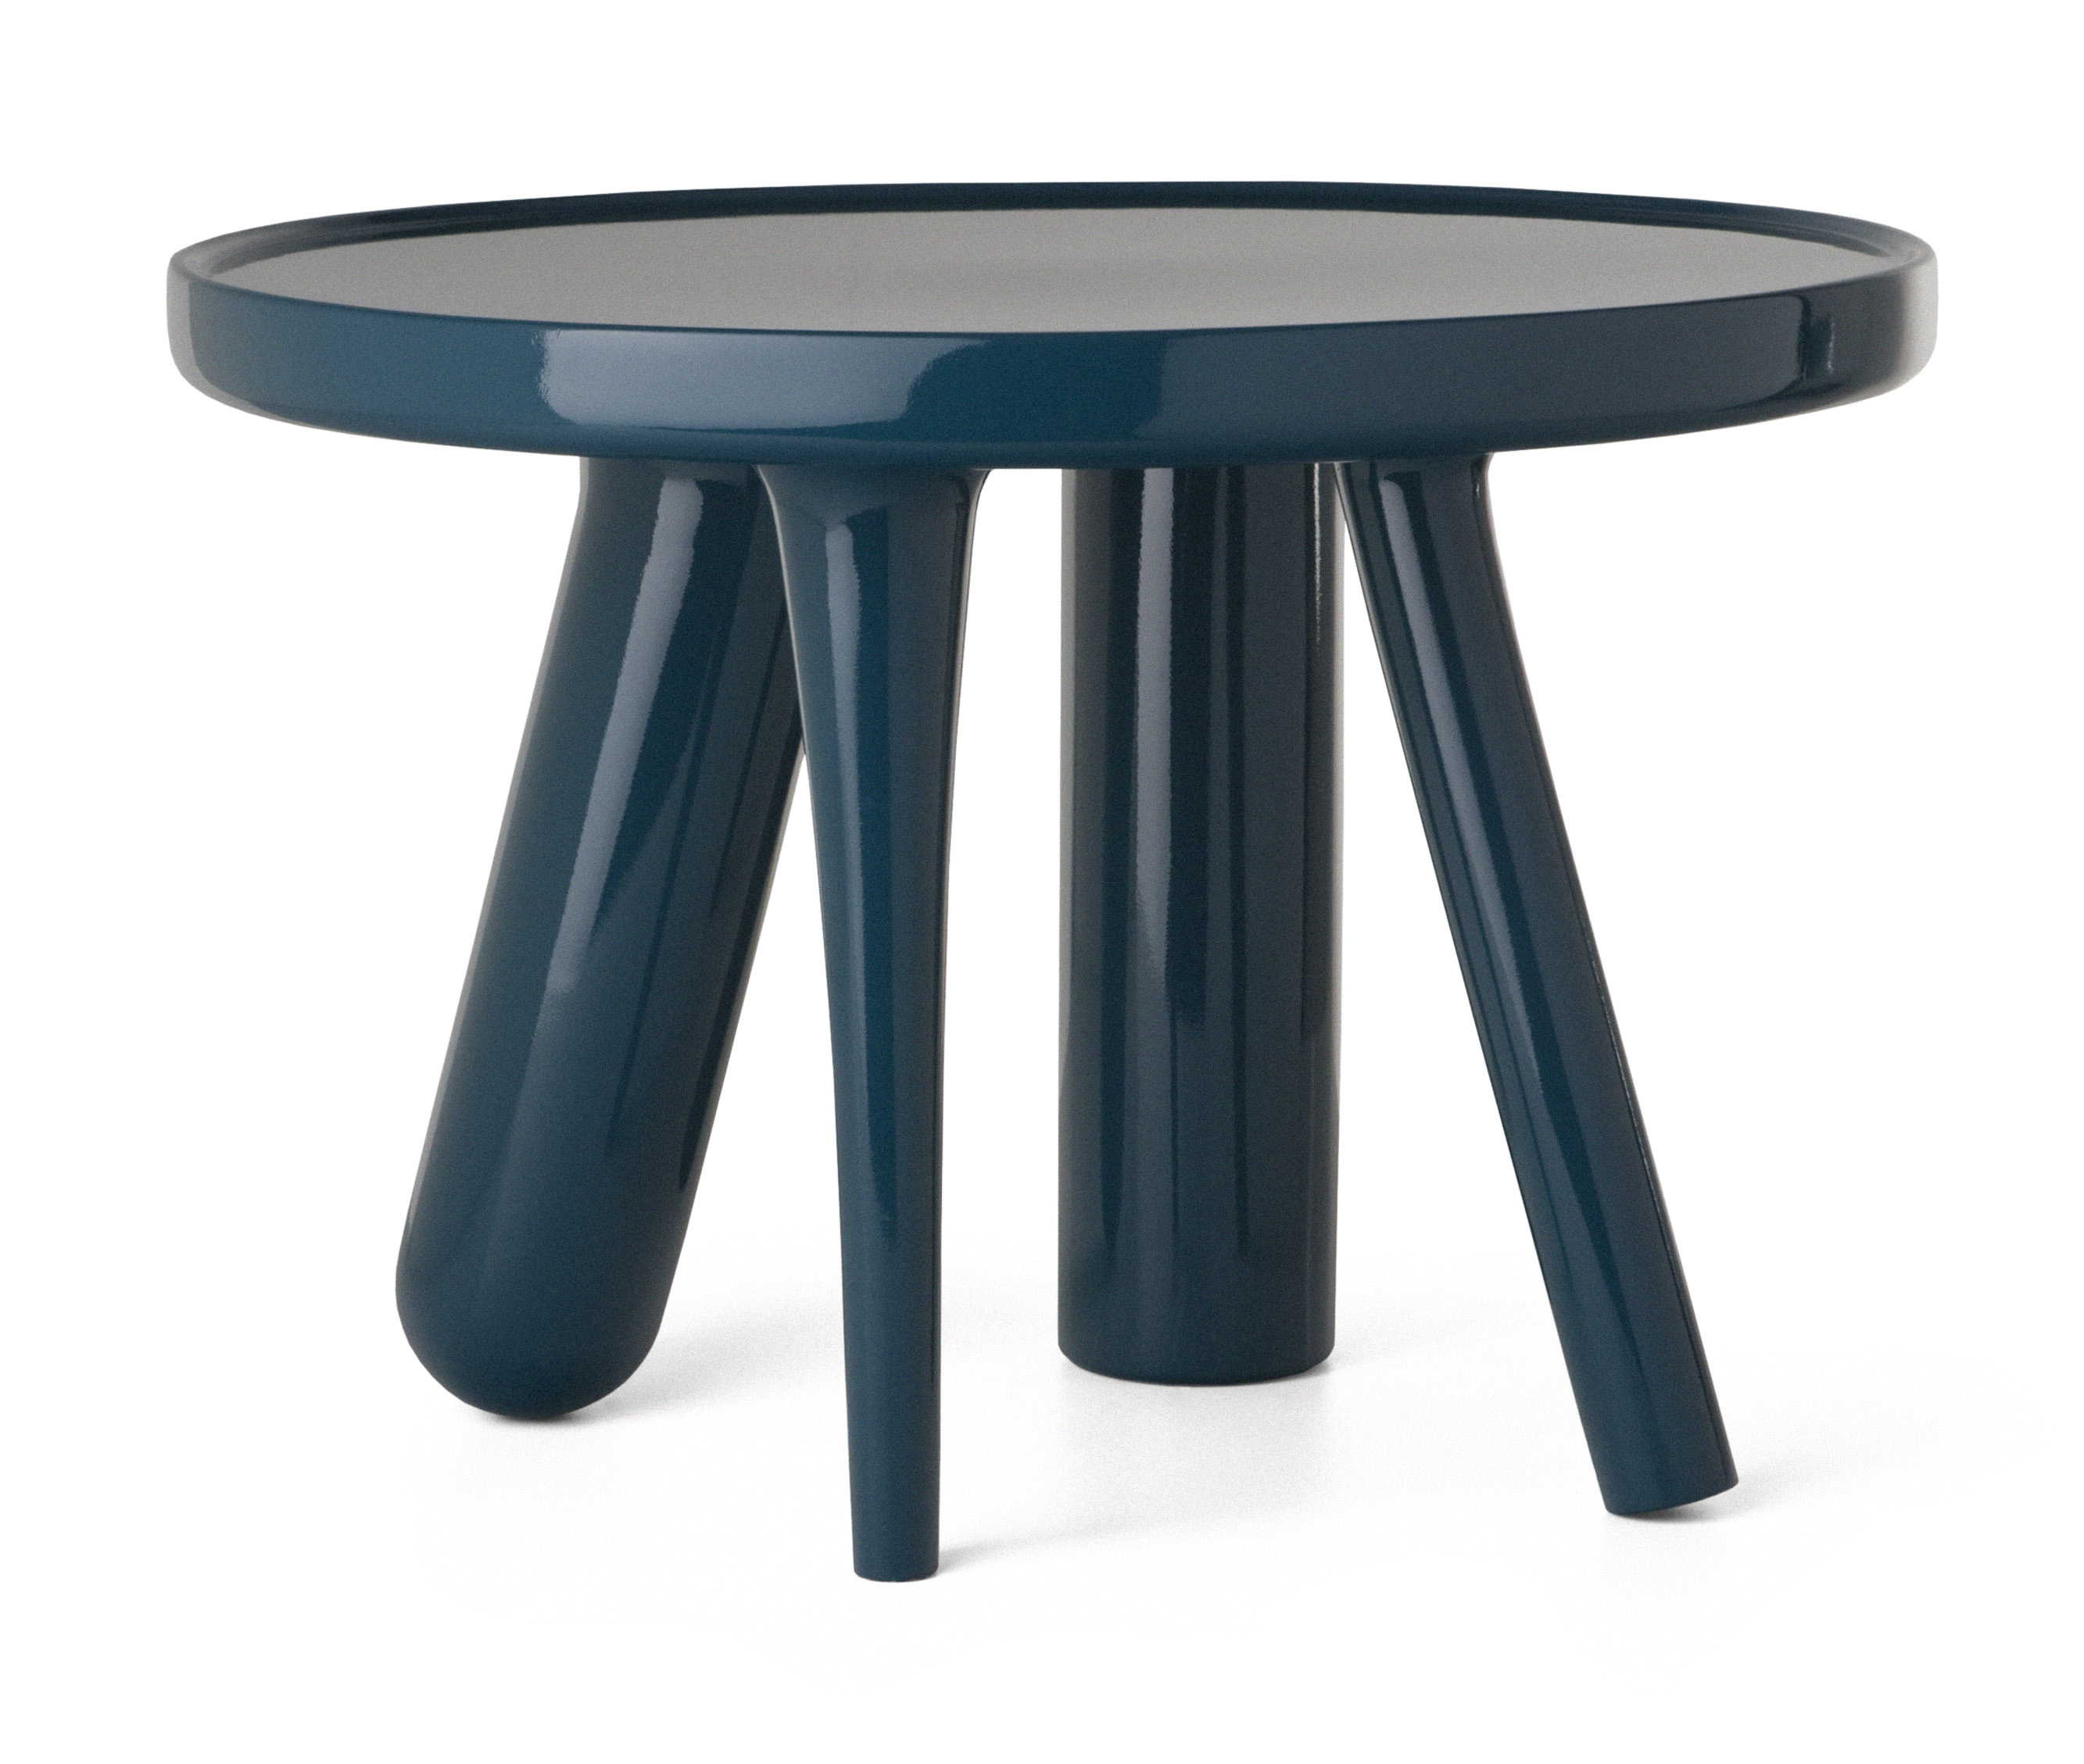 jaime hayon elements table